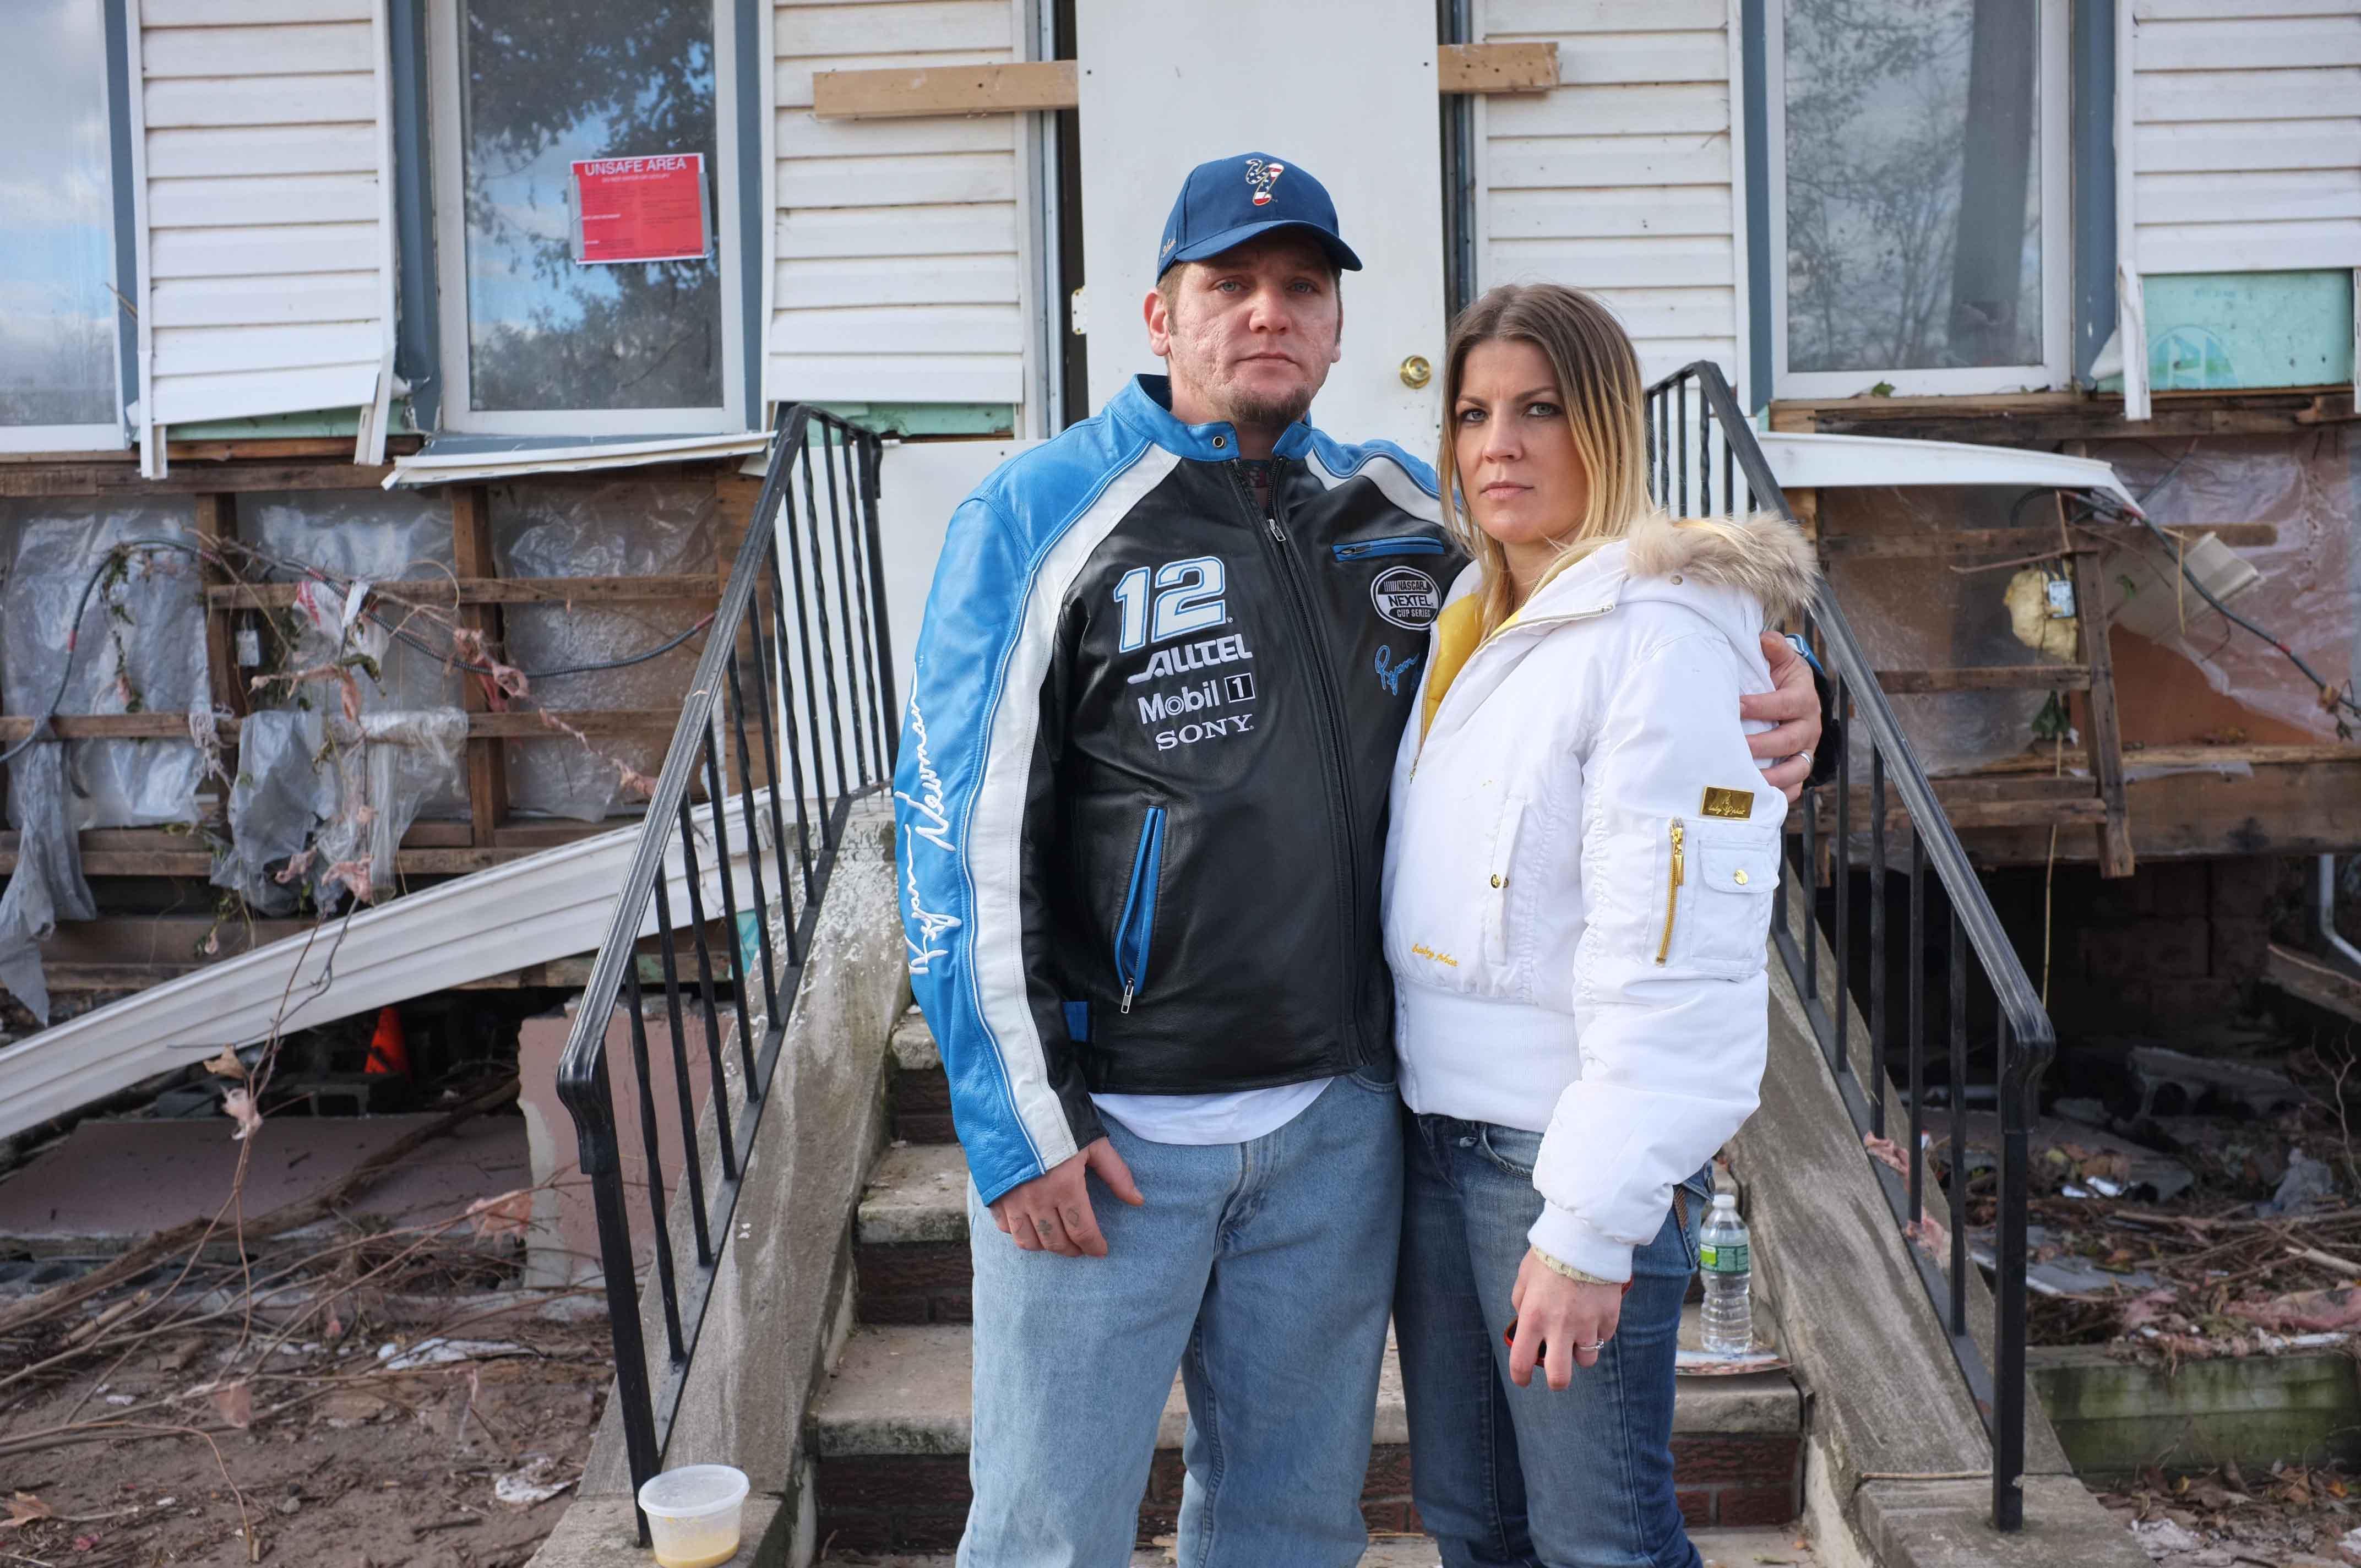 2012-11-07-ScottAckermanetsafemmeKelly.jpg